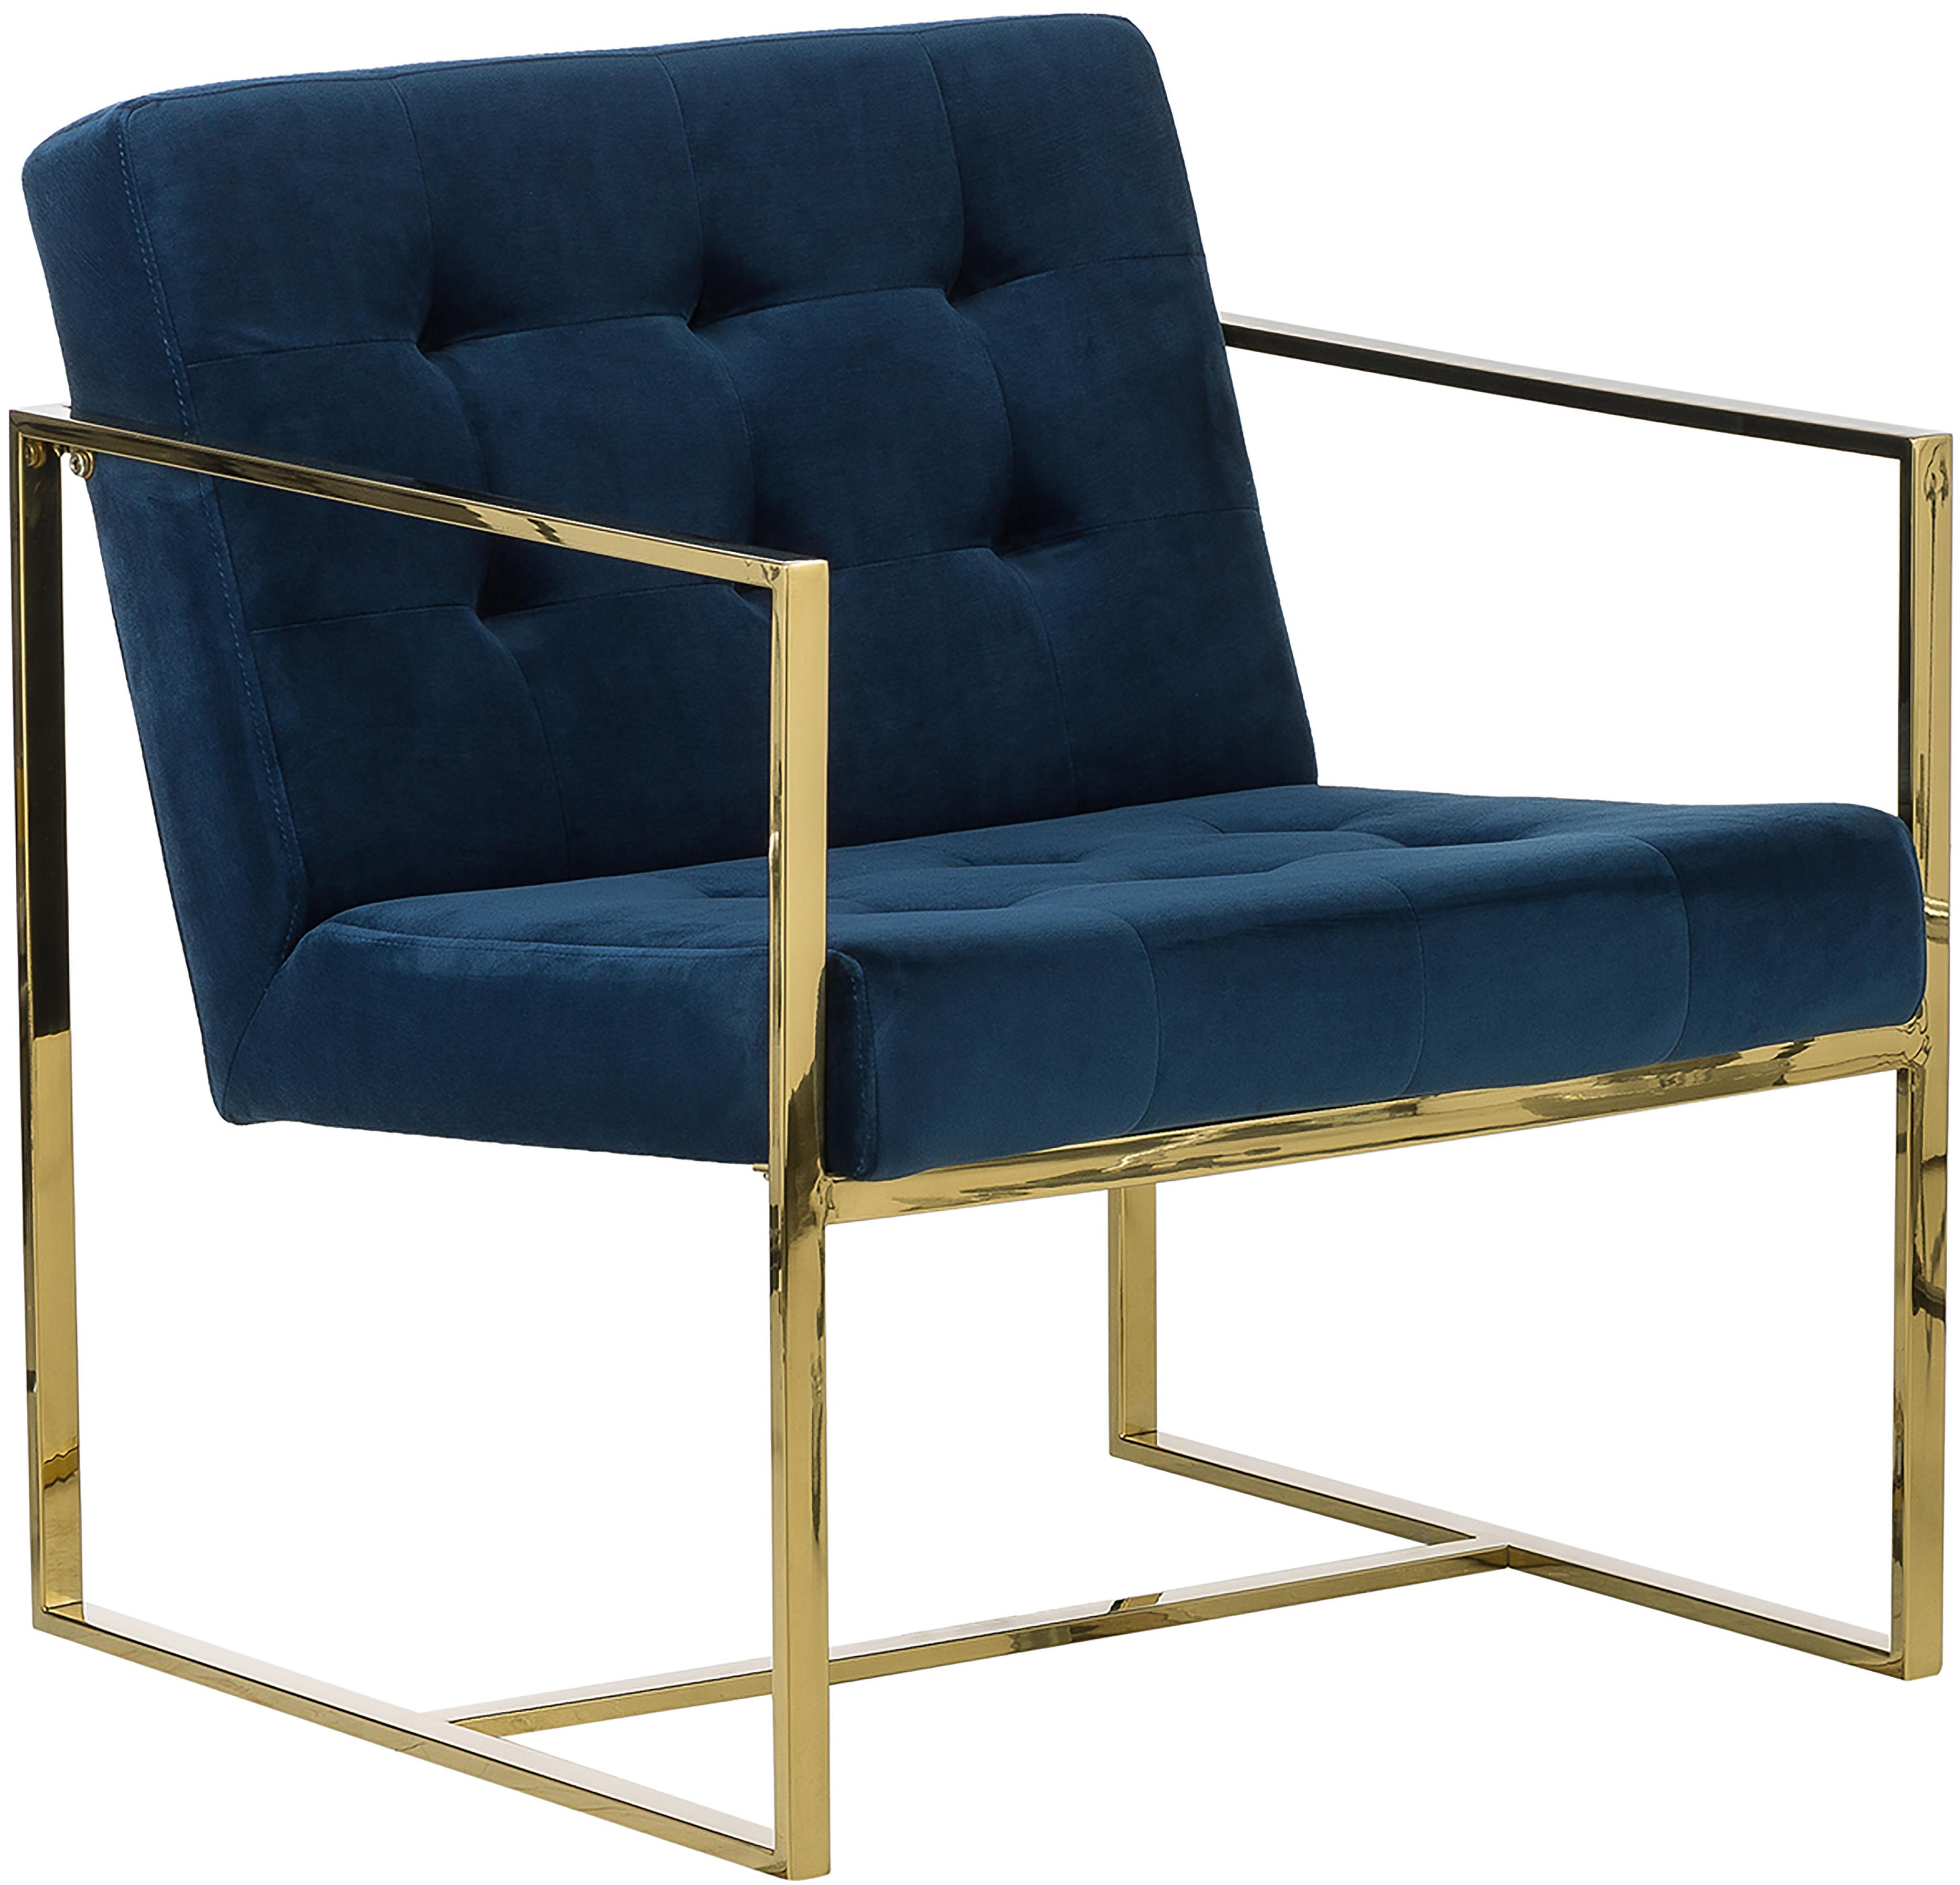 Fluwelen fauteuil Manhattan, Bekleding: fluweel (polyester), Frame: gecoat metaal, Blauw, B 70 x D 72 cm